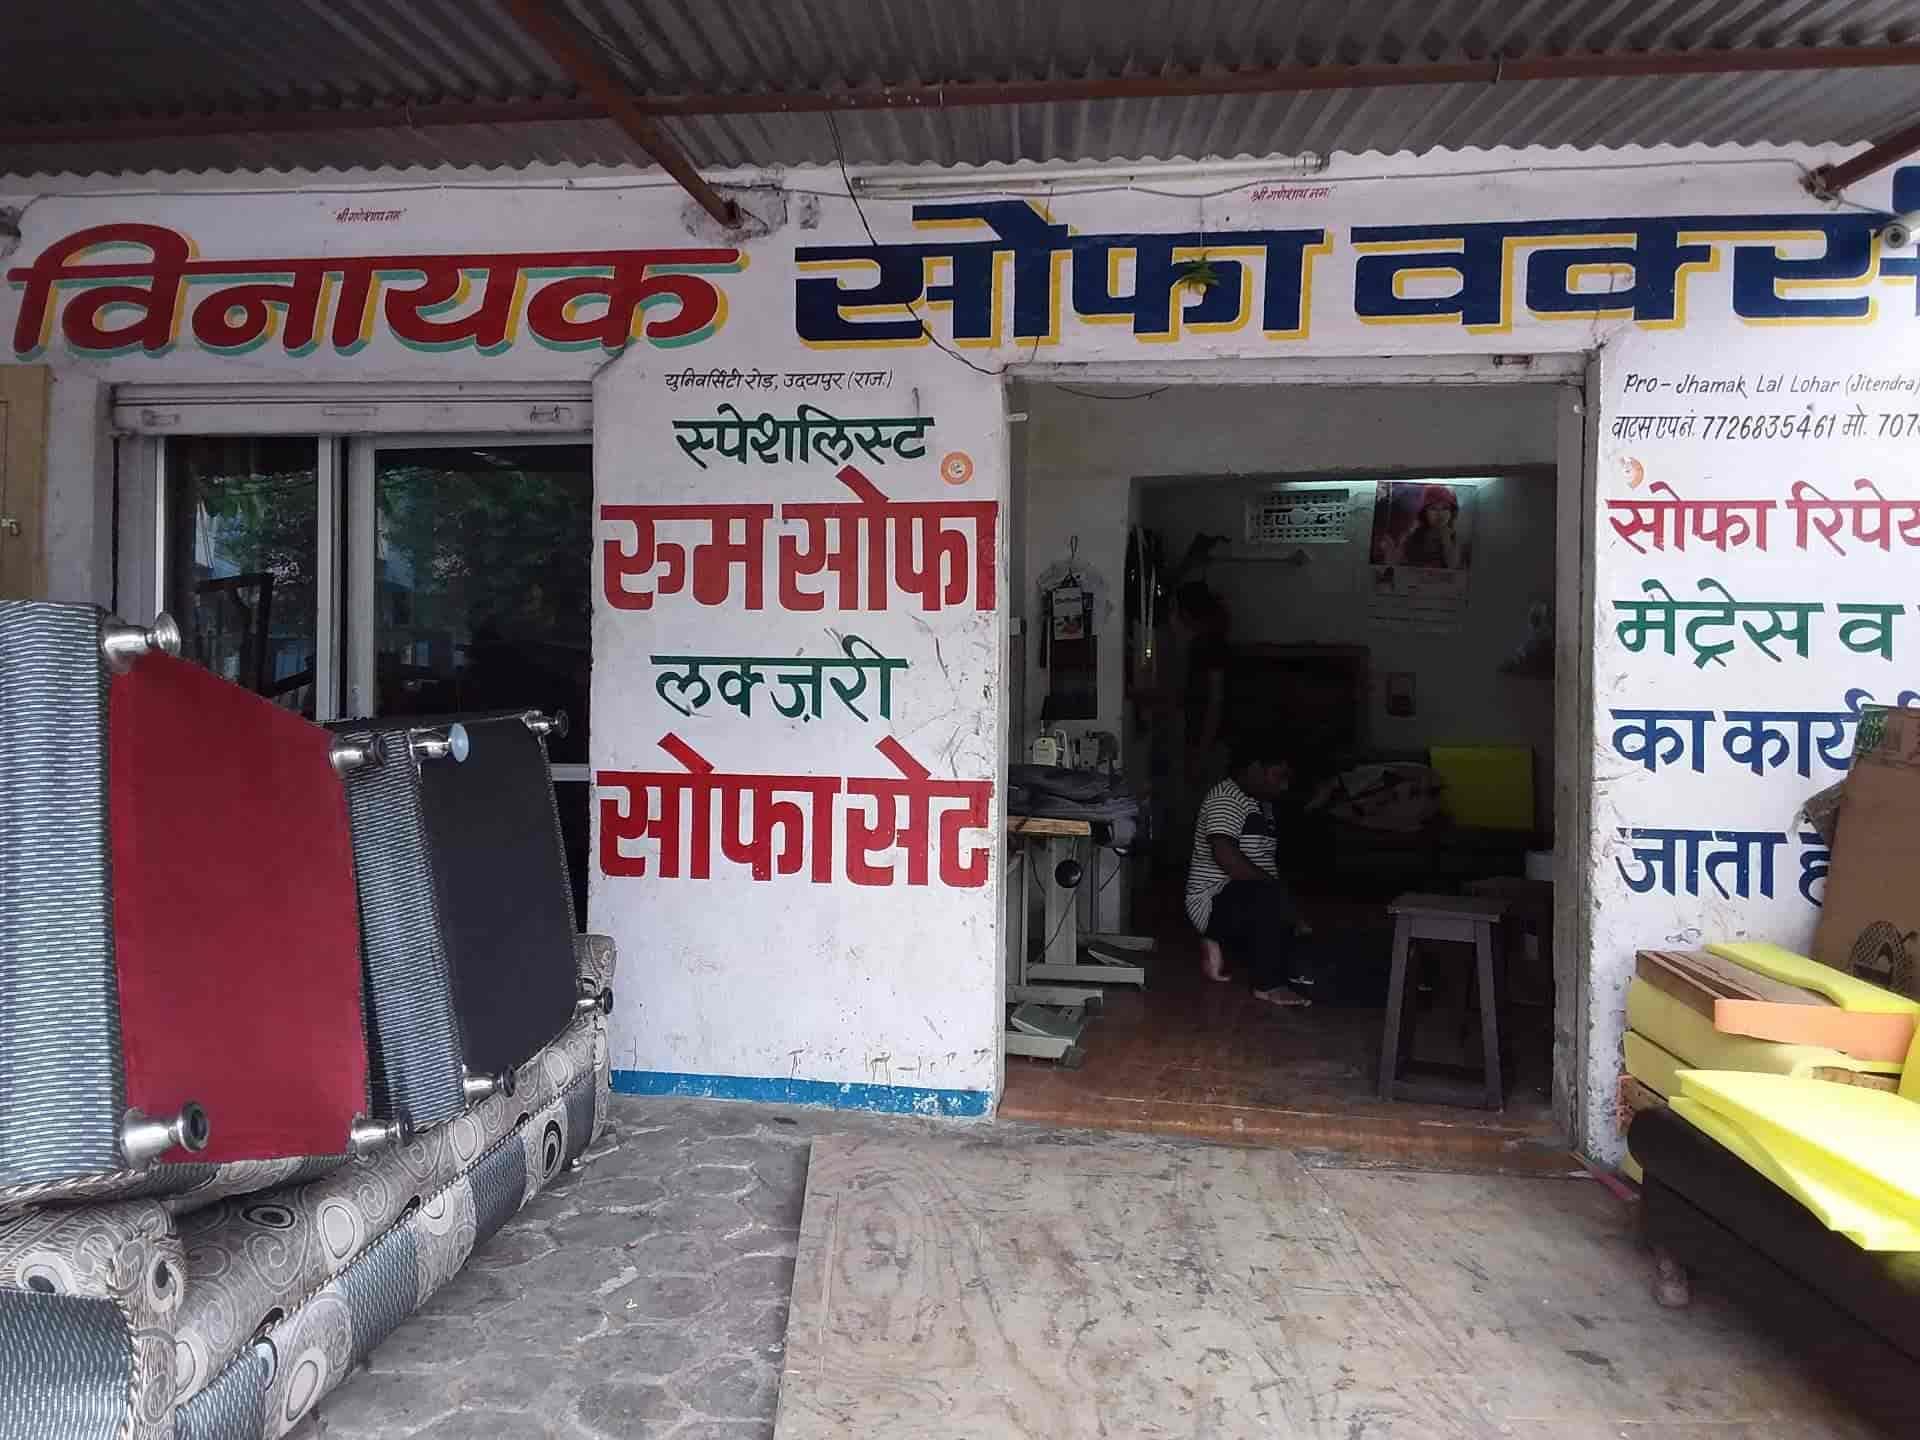 Top Sofa Foam Manufacturers in 1050, Udaipur-Rajasthan - Justdial